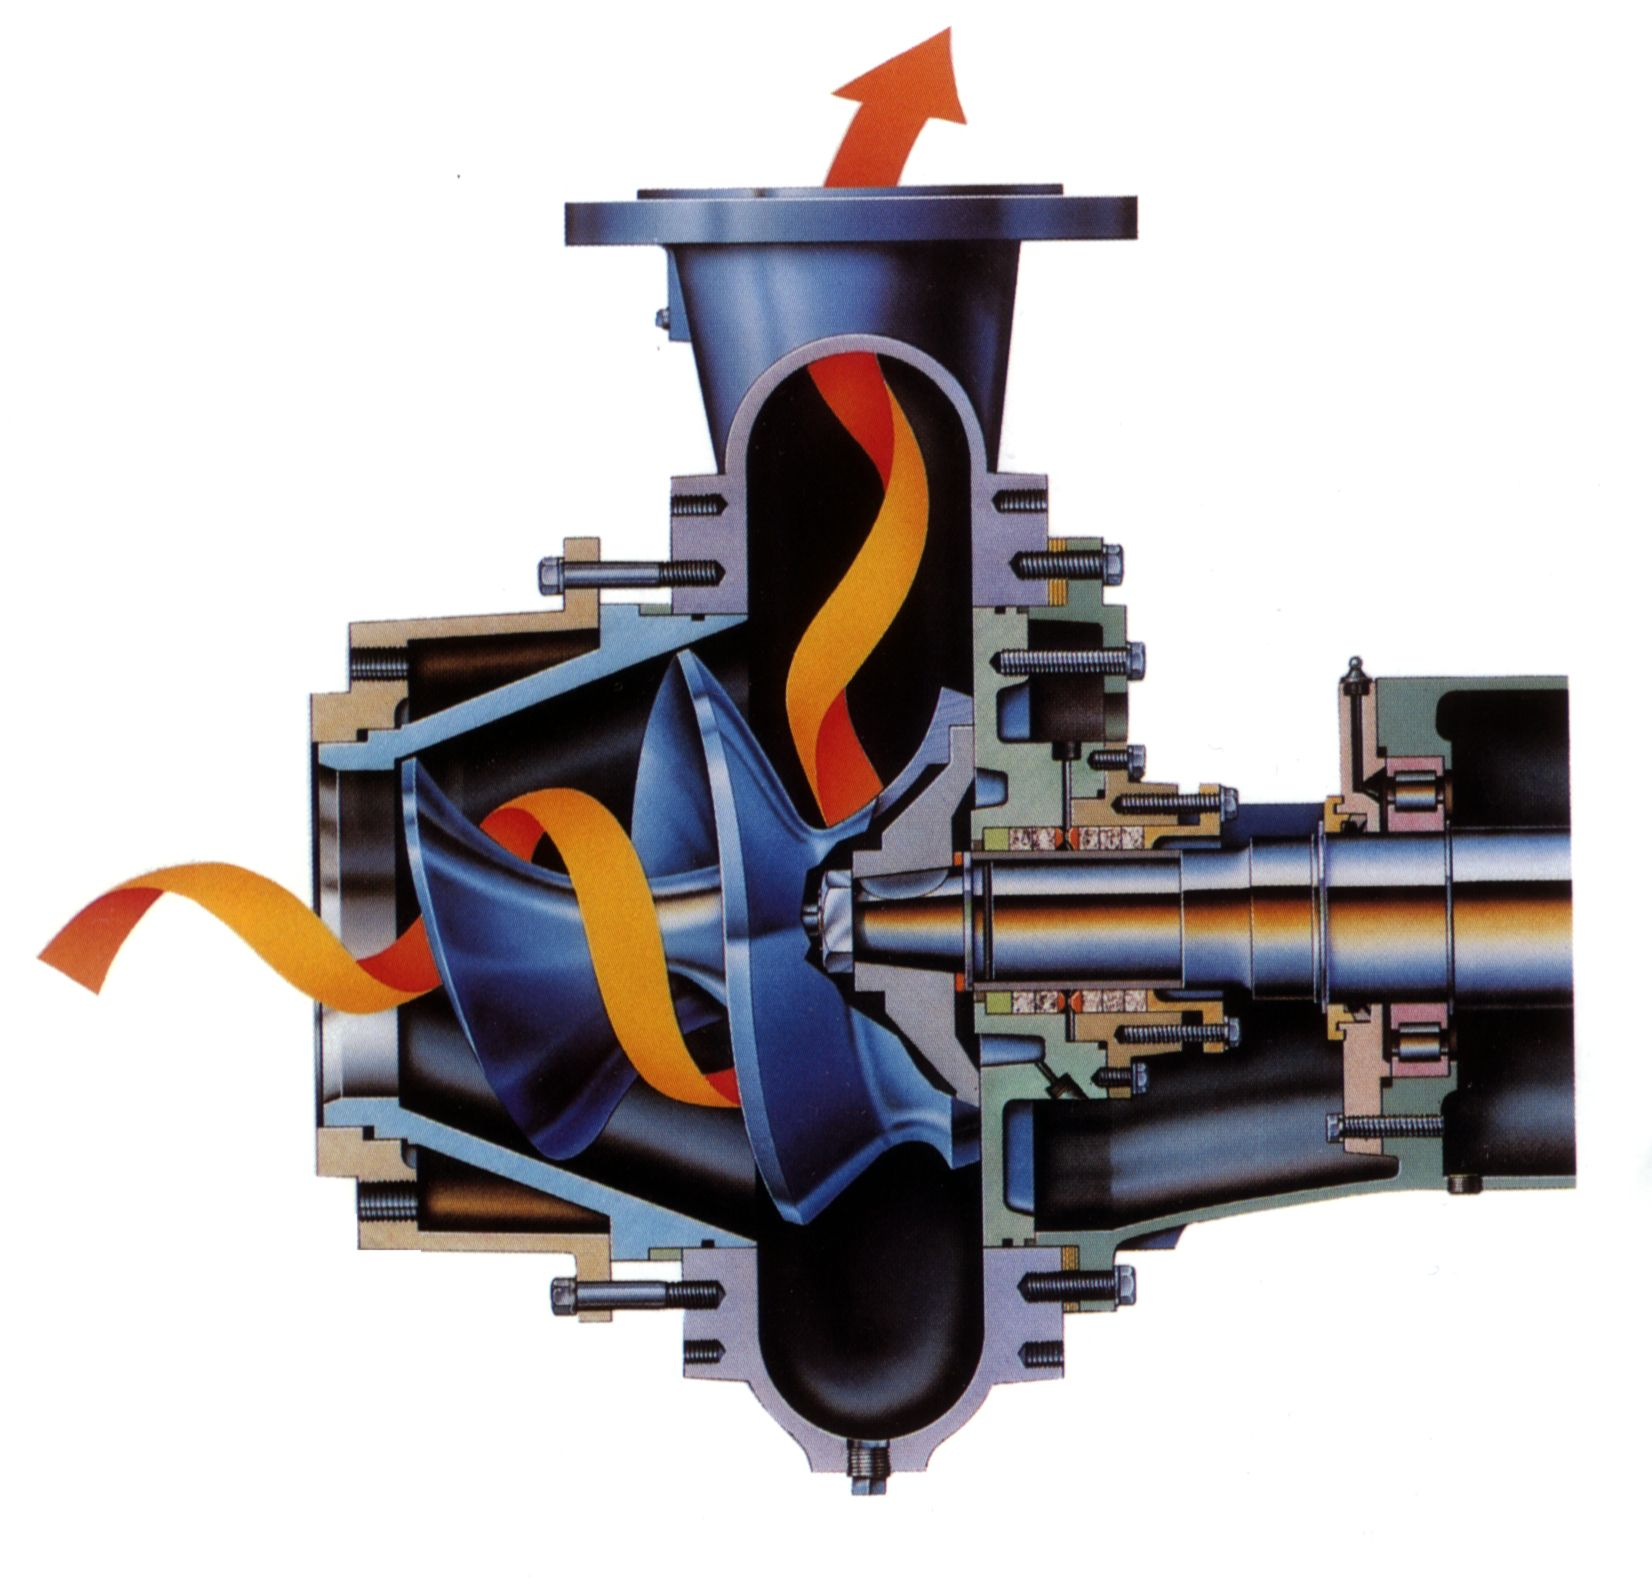 Cutaway of centrifugal pump (for viscous liquids